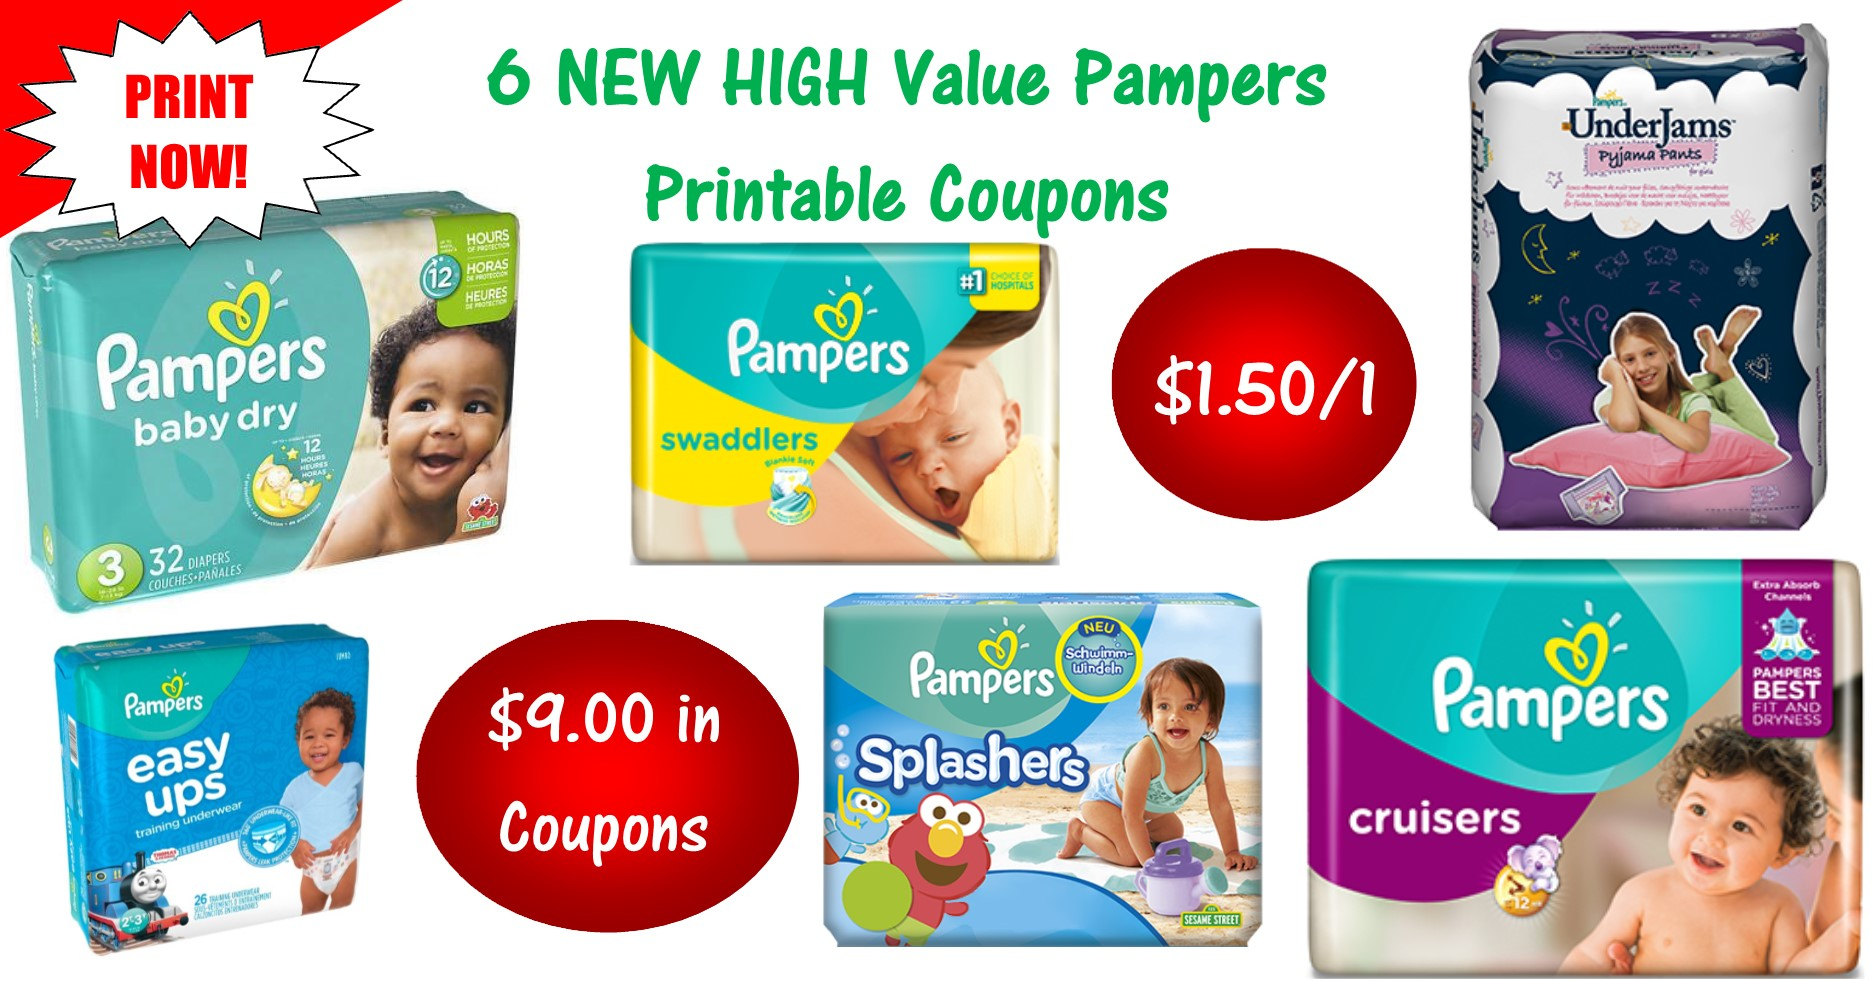 6 Pampers Printable Coupons ~ Print Now! $9 In Savings! - Free Printable Coupons For Pampers Pull Ups